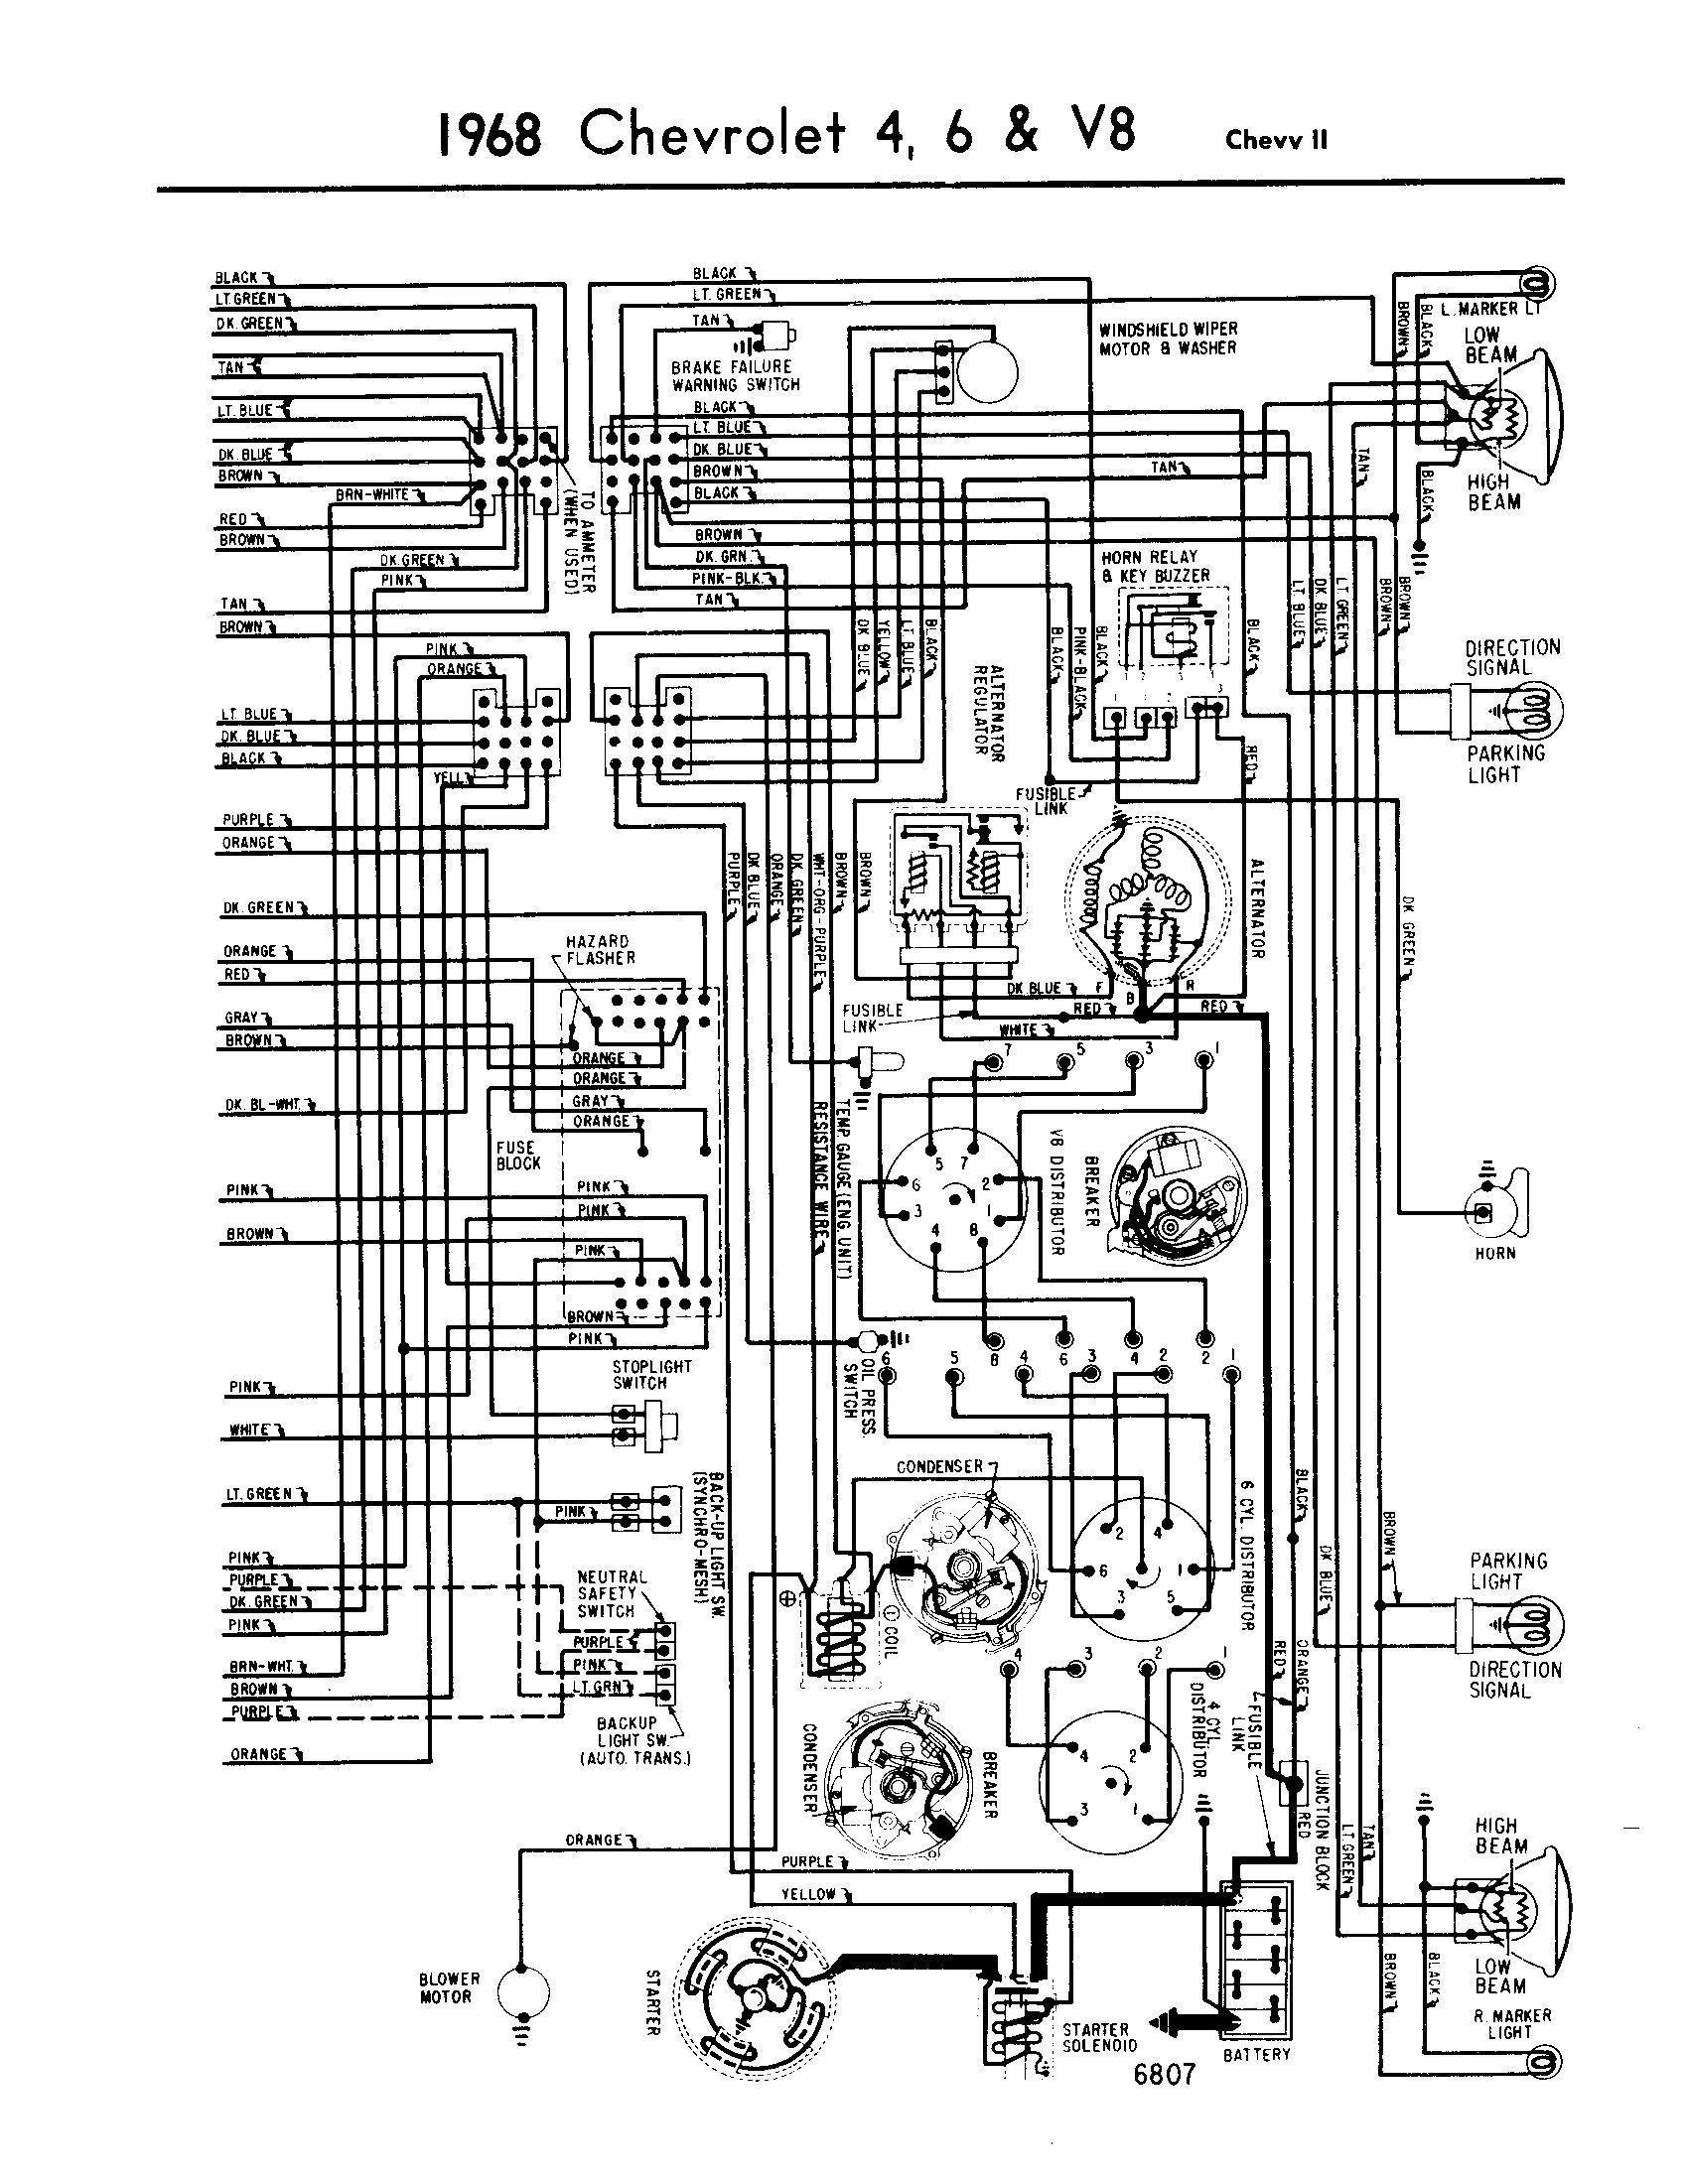 69 Camaro Wiring Diagram 1969 Camaro Wiring Diagram Printable Worksheet and Wiring Diagram •